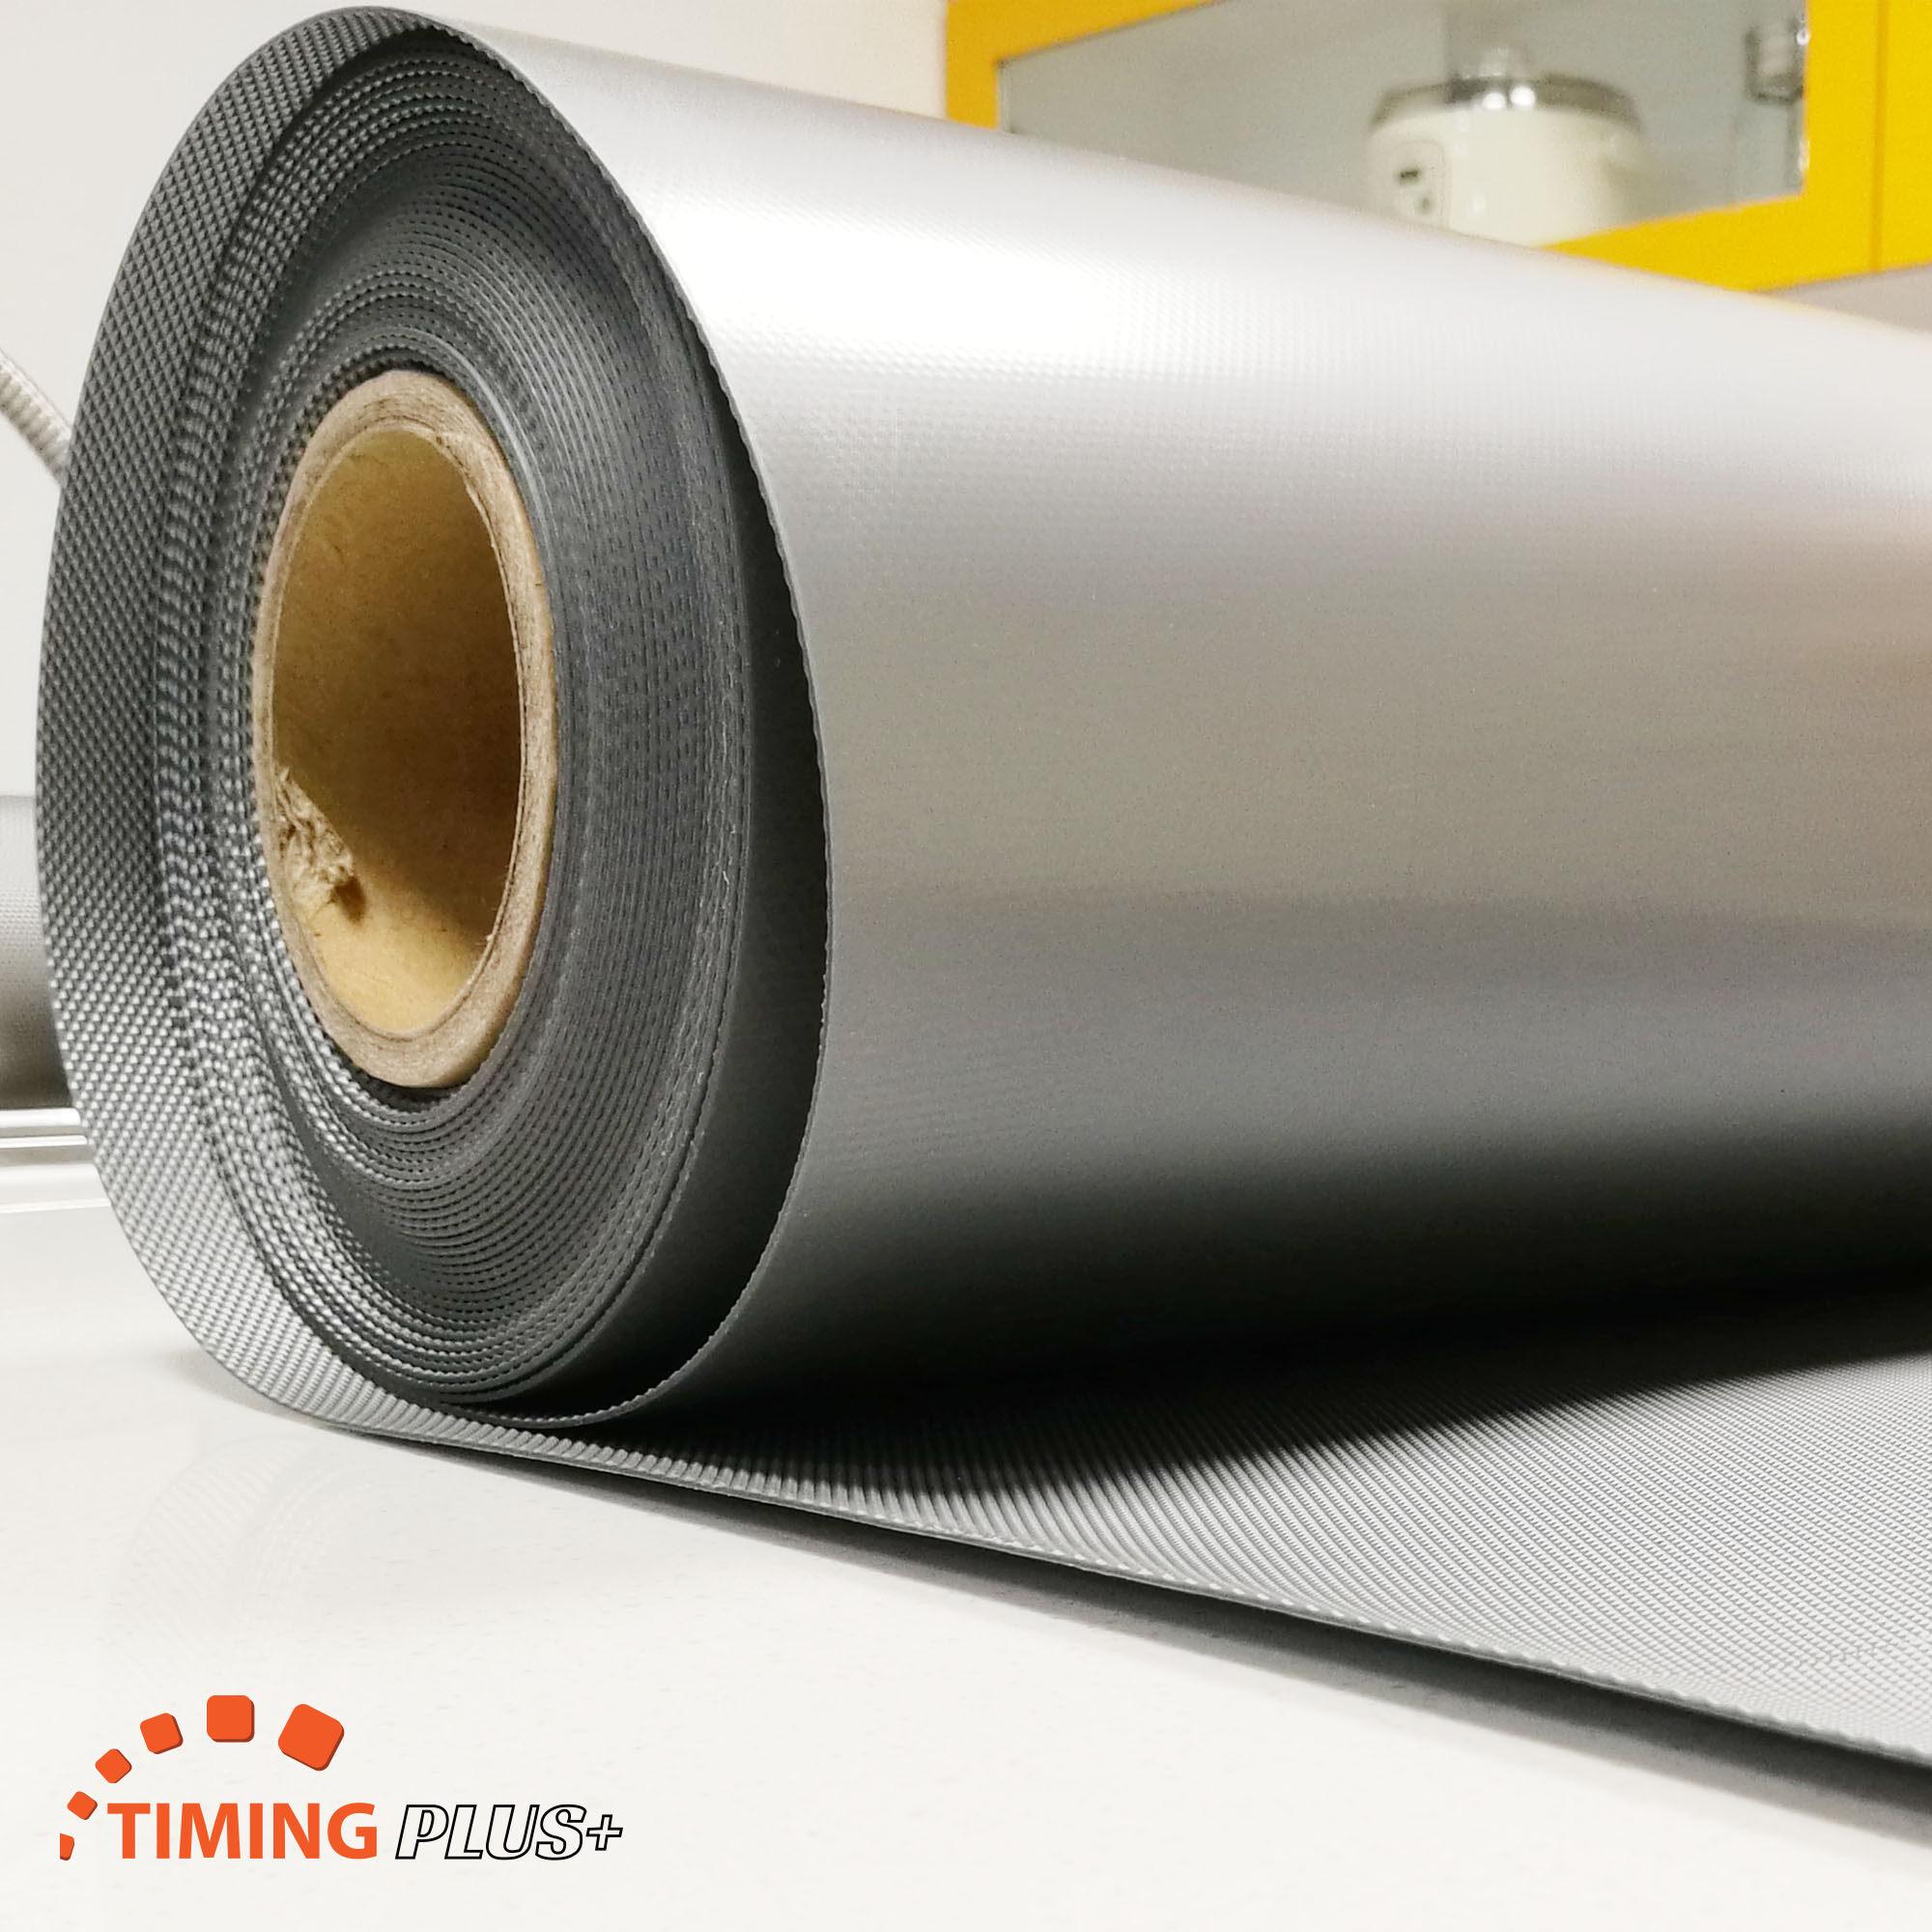 HIGH QUALITY Slip Matt For Drawer/Table/Car 1 Roll 500mm x 20meter (Thickness 1.4mm)